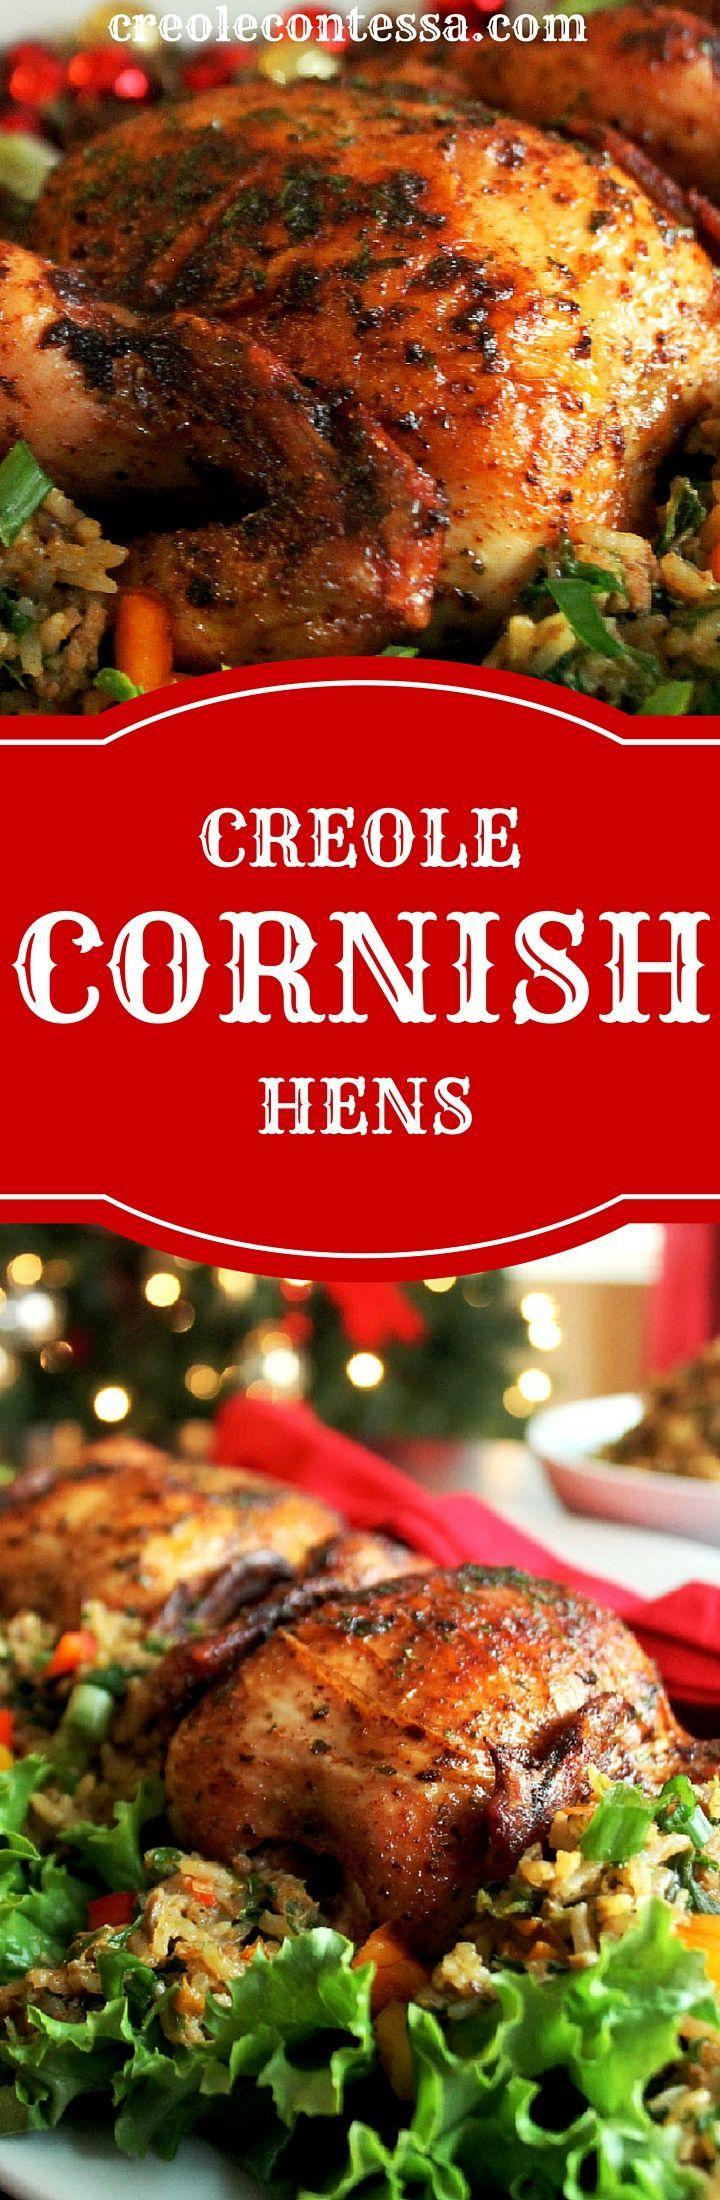 Creole Cornish Hens with Rice Dressing-Creole Contessa #ad #CornishHenHolidays #CollectiveBias